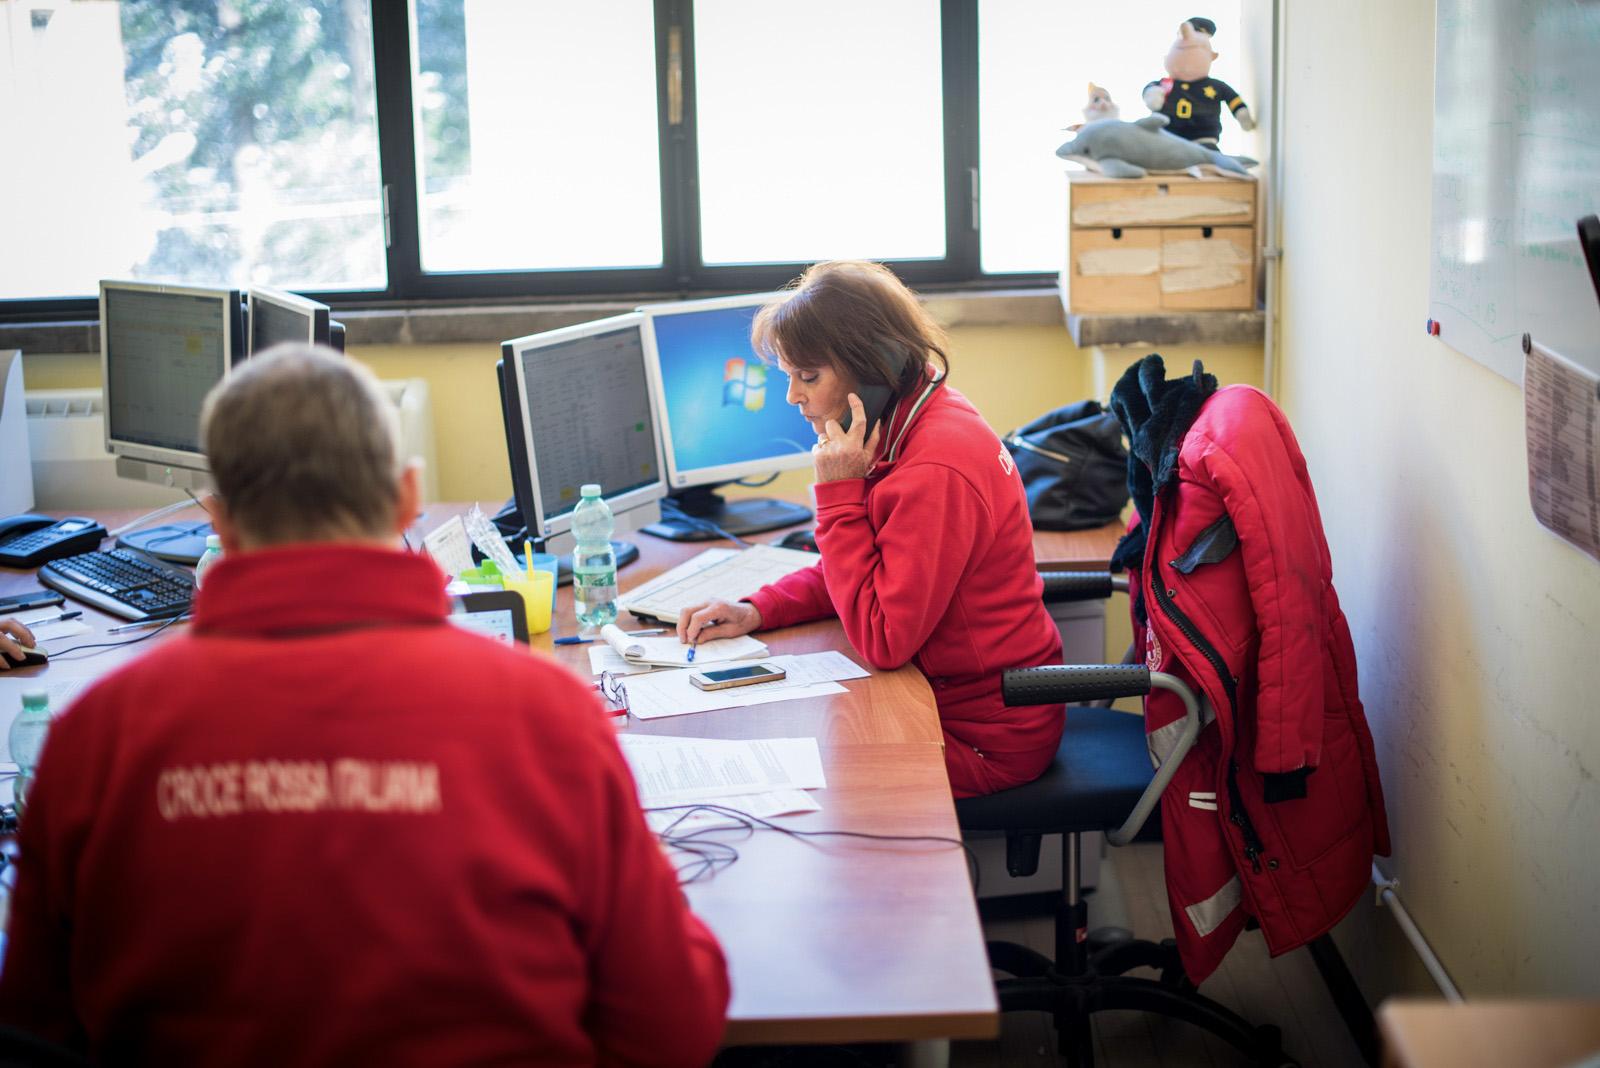 Sala Operativa. Sala Roma.Croce Rossa Italiana - Comitato Area Metropolitana di Roma Capitale.